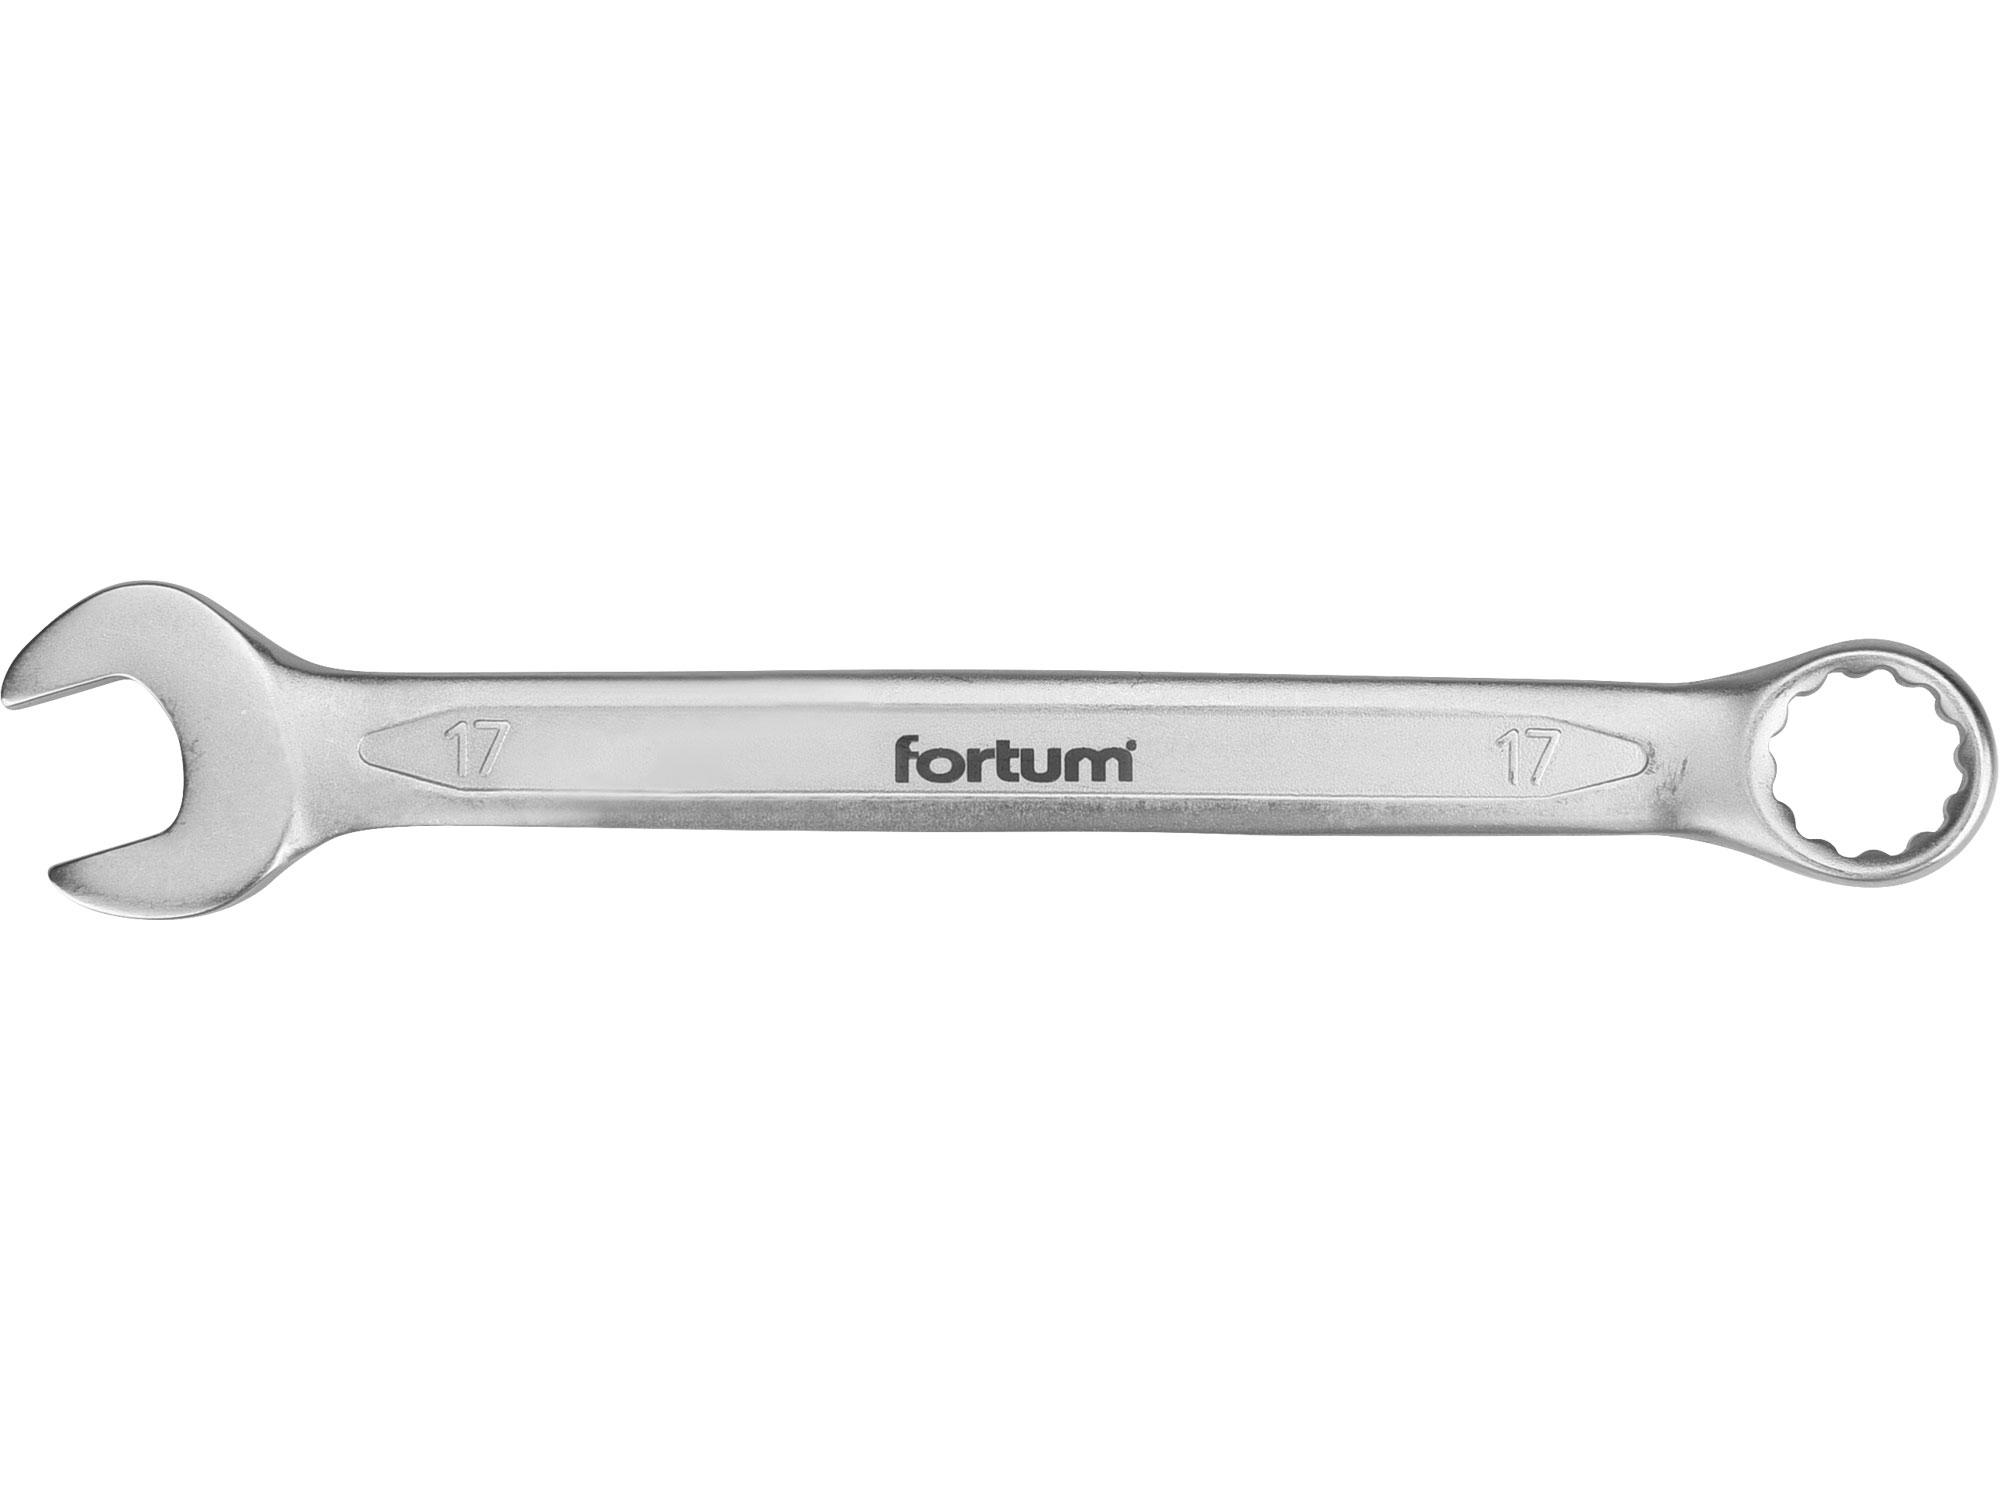 klíč očkoplochý, 17mm, L 221mm, FORTUM 4730217